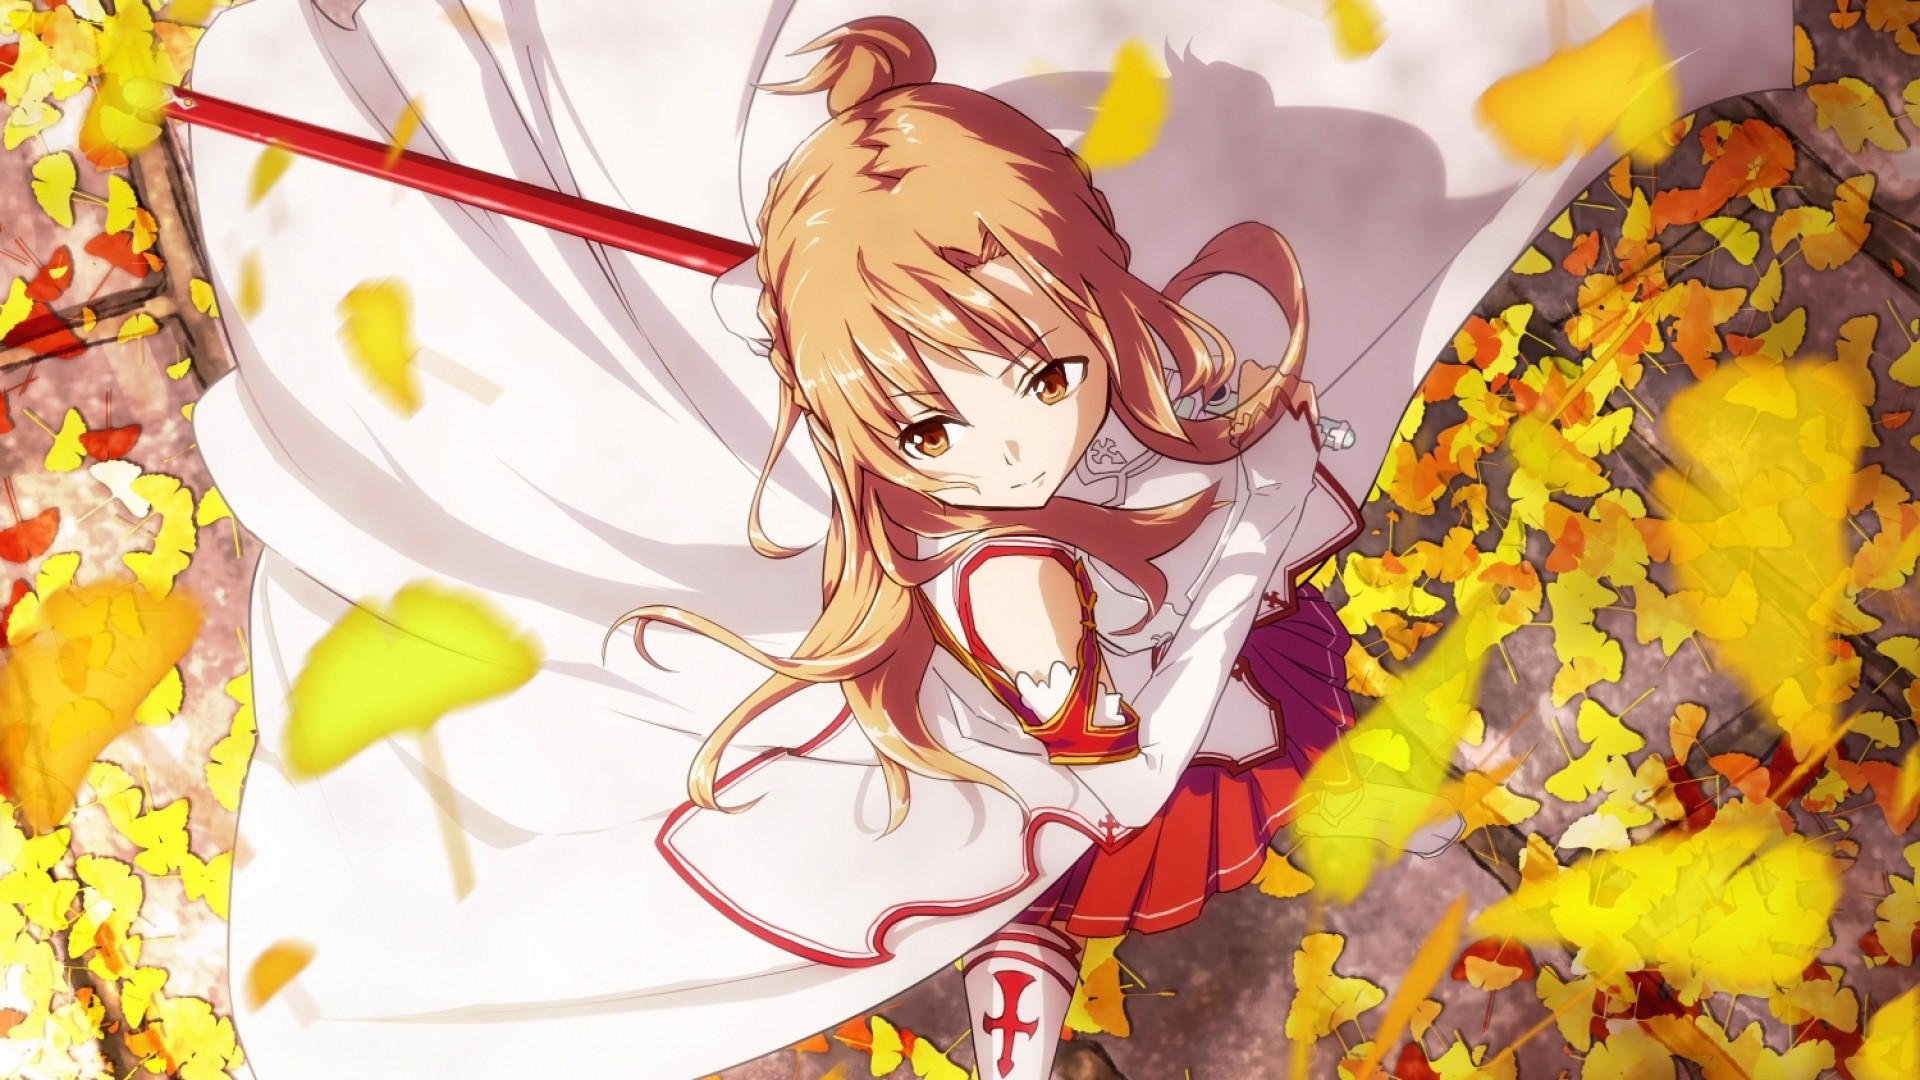 Anime – Sword Art Online Asuna Yuuki Wallpaper